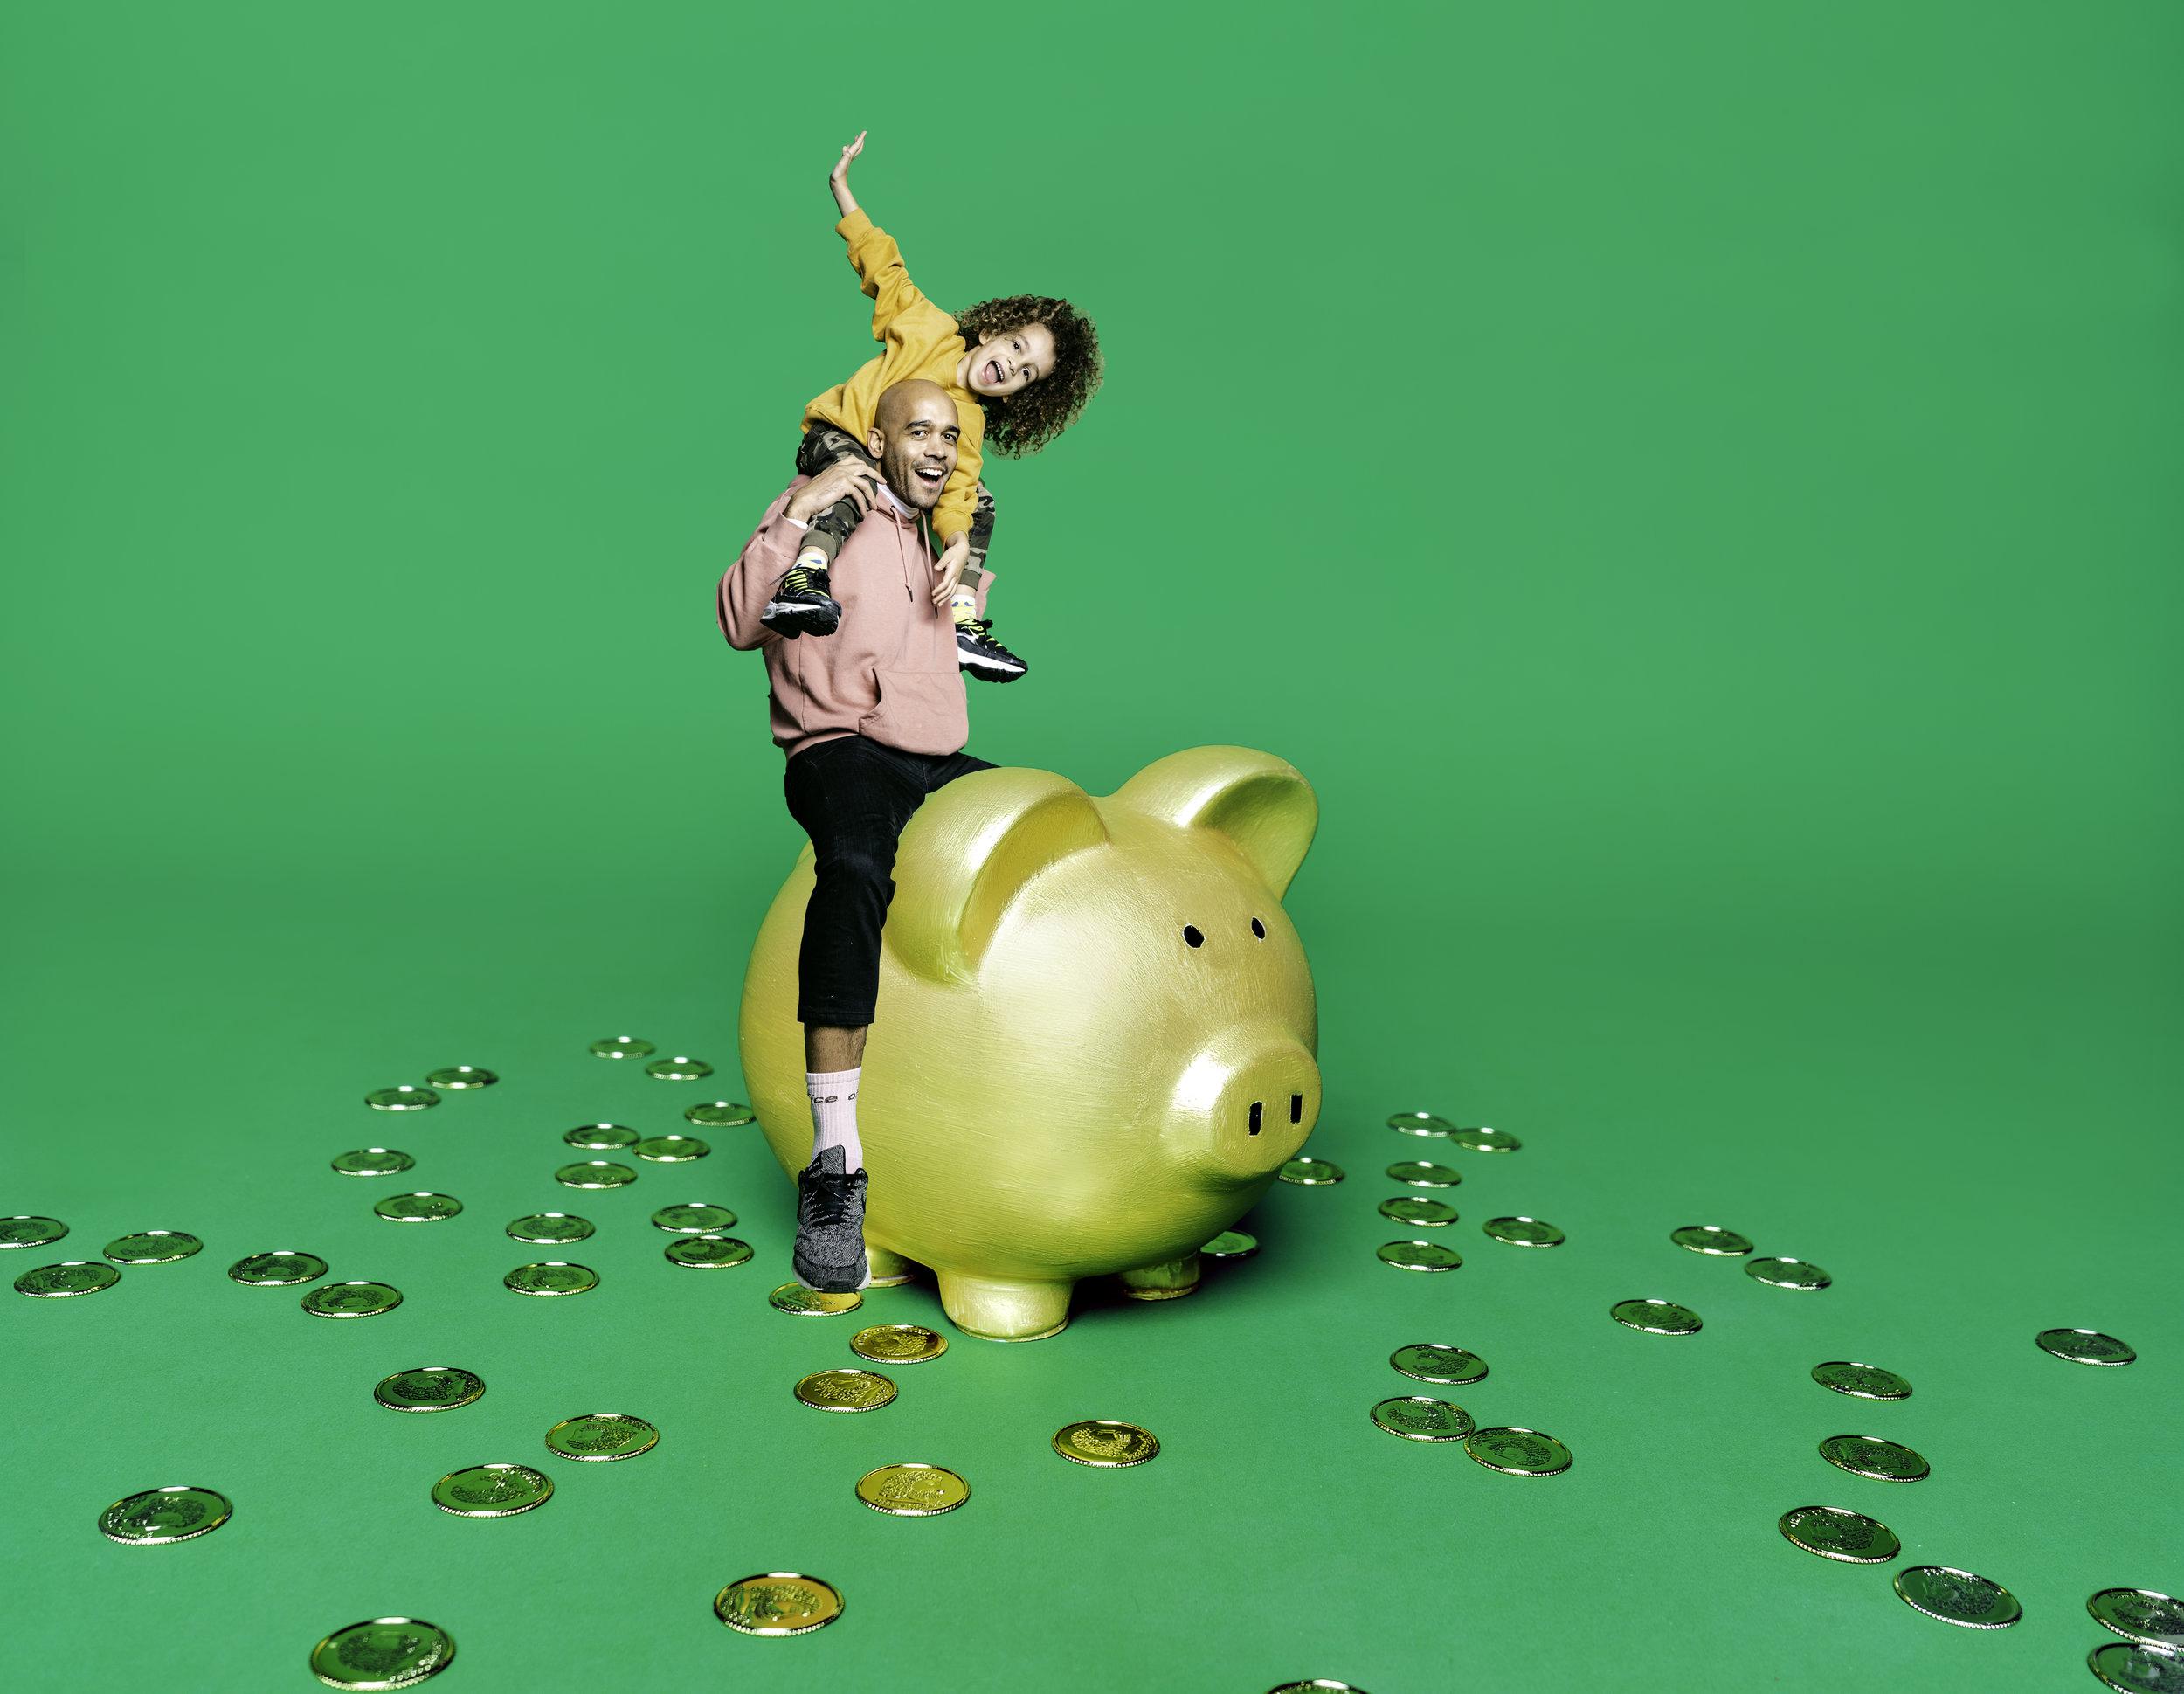 On Pig.jpg